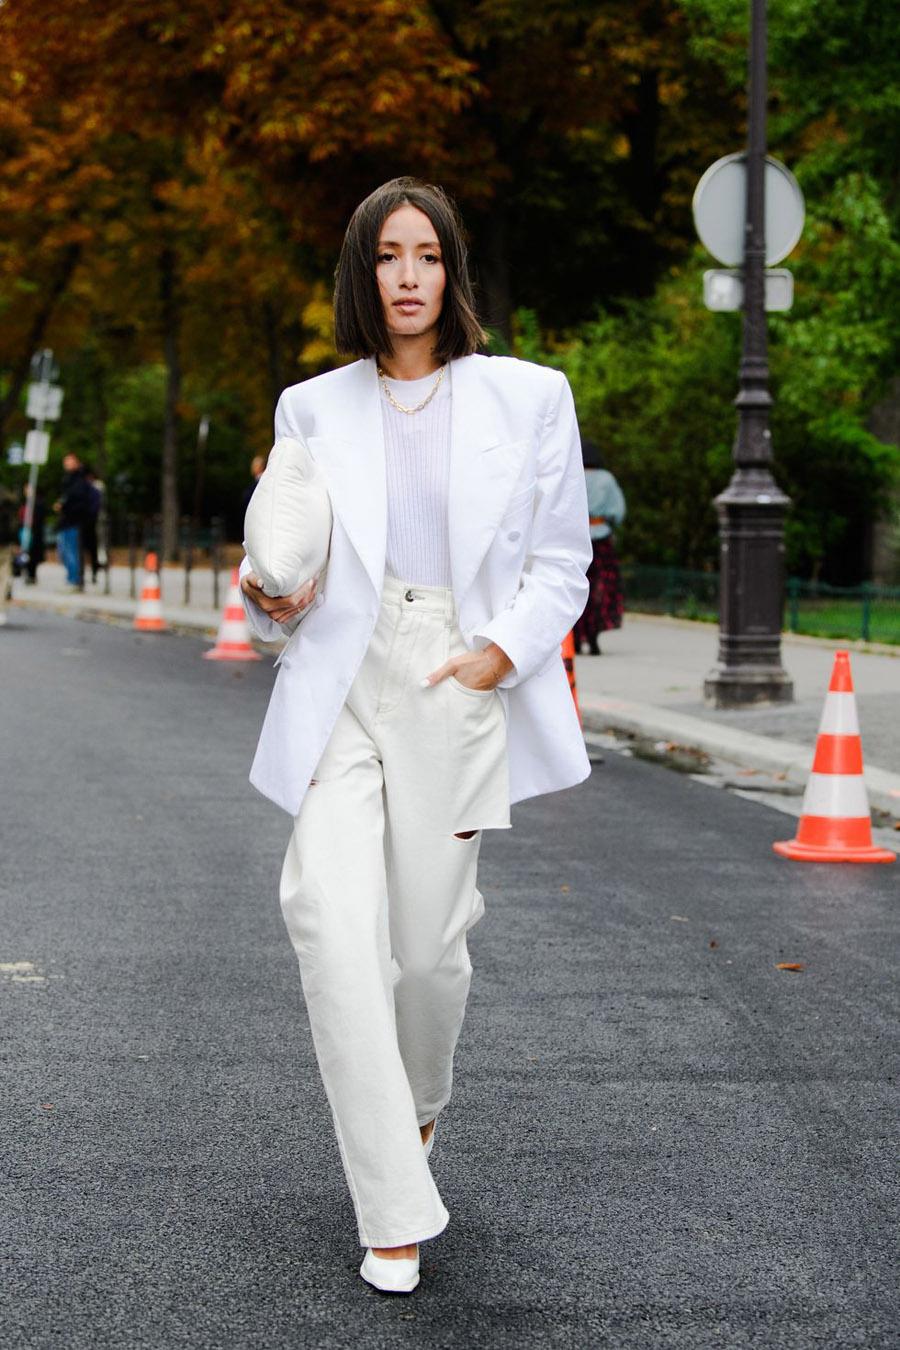 paris-fashion-week-pfw-street-style-ss20-day-2-by-tyler-joe-141-1569745067